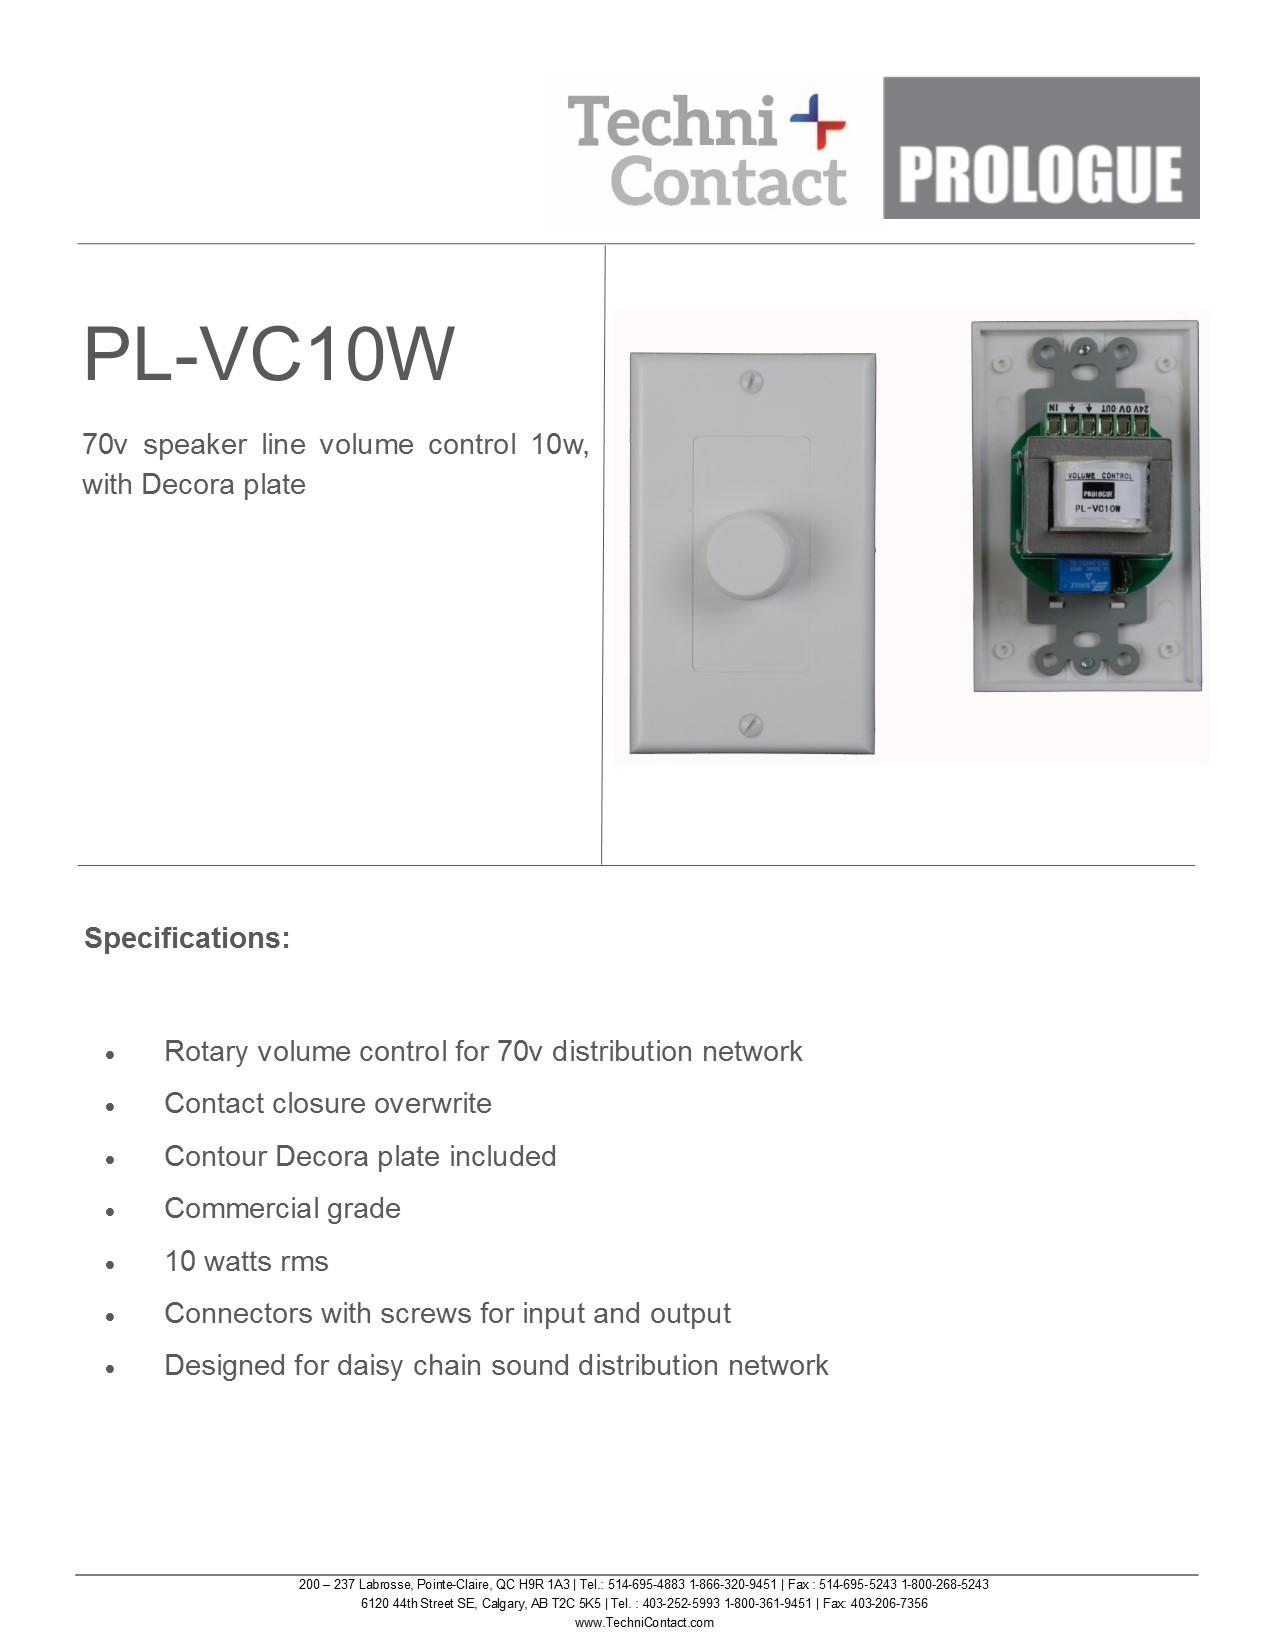 Prologue_PL-VC10W_SPECS.jpg